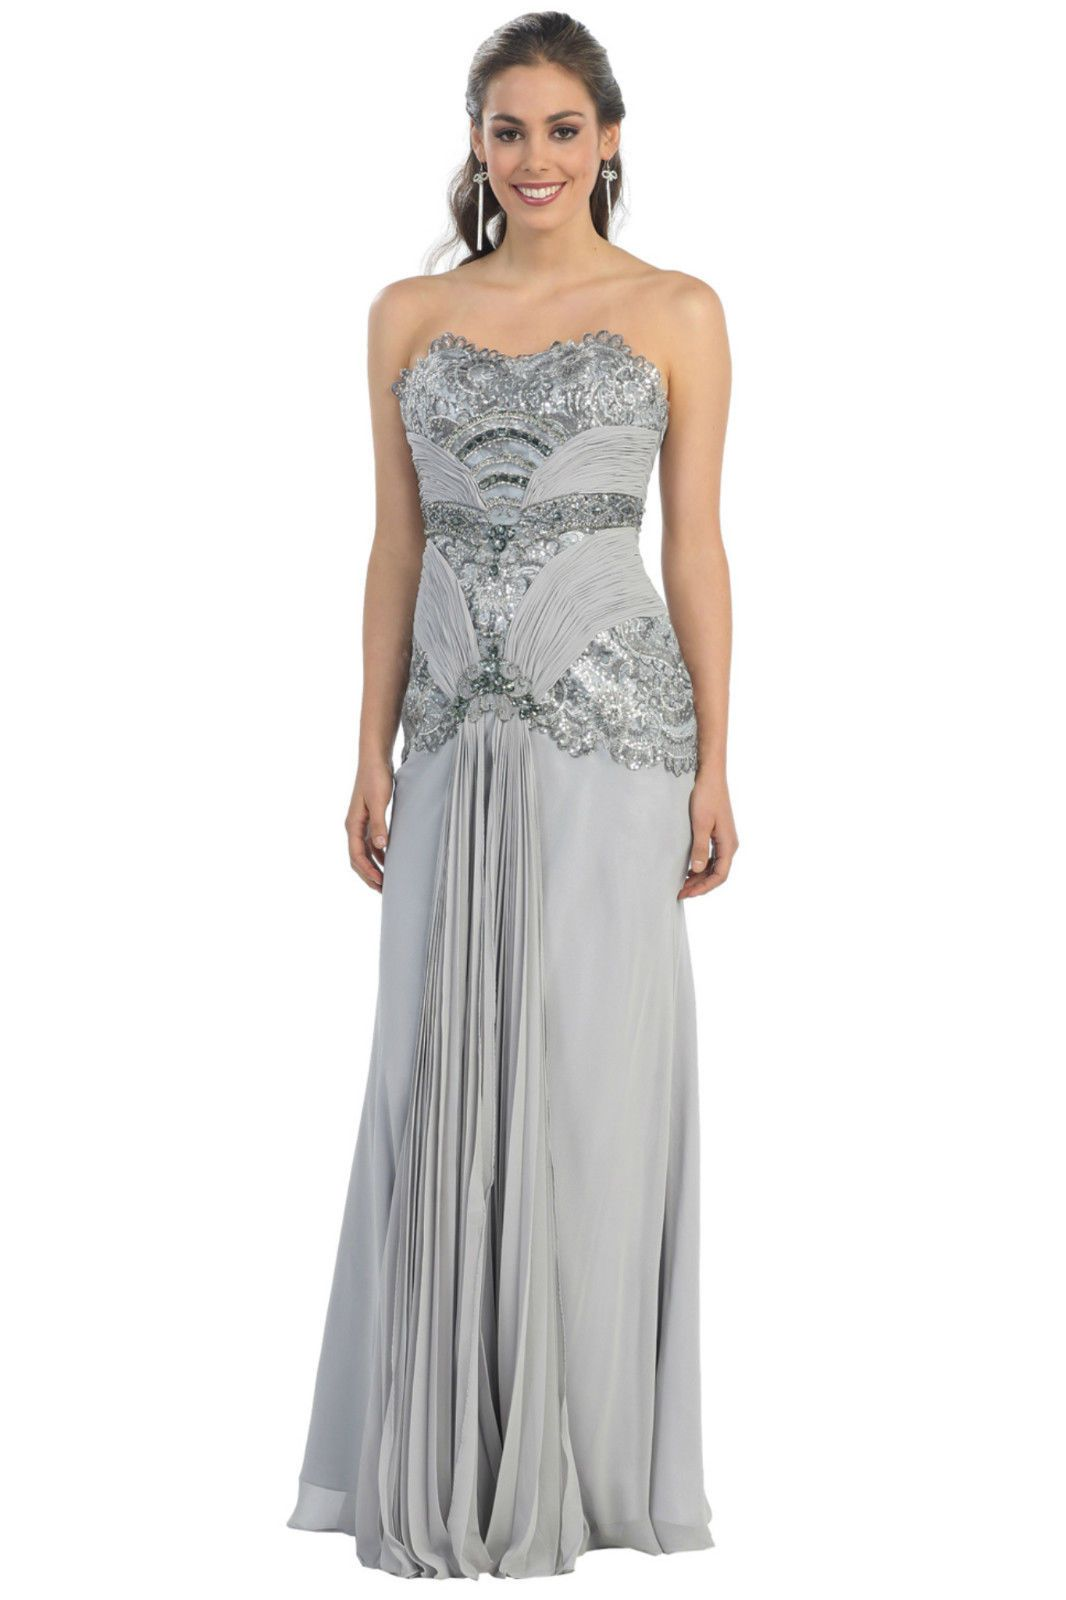 Vintage Hollywood Mother of the Bride Dresses